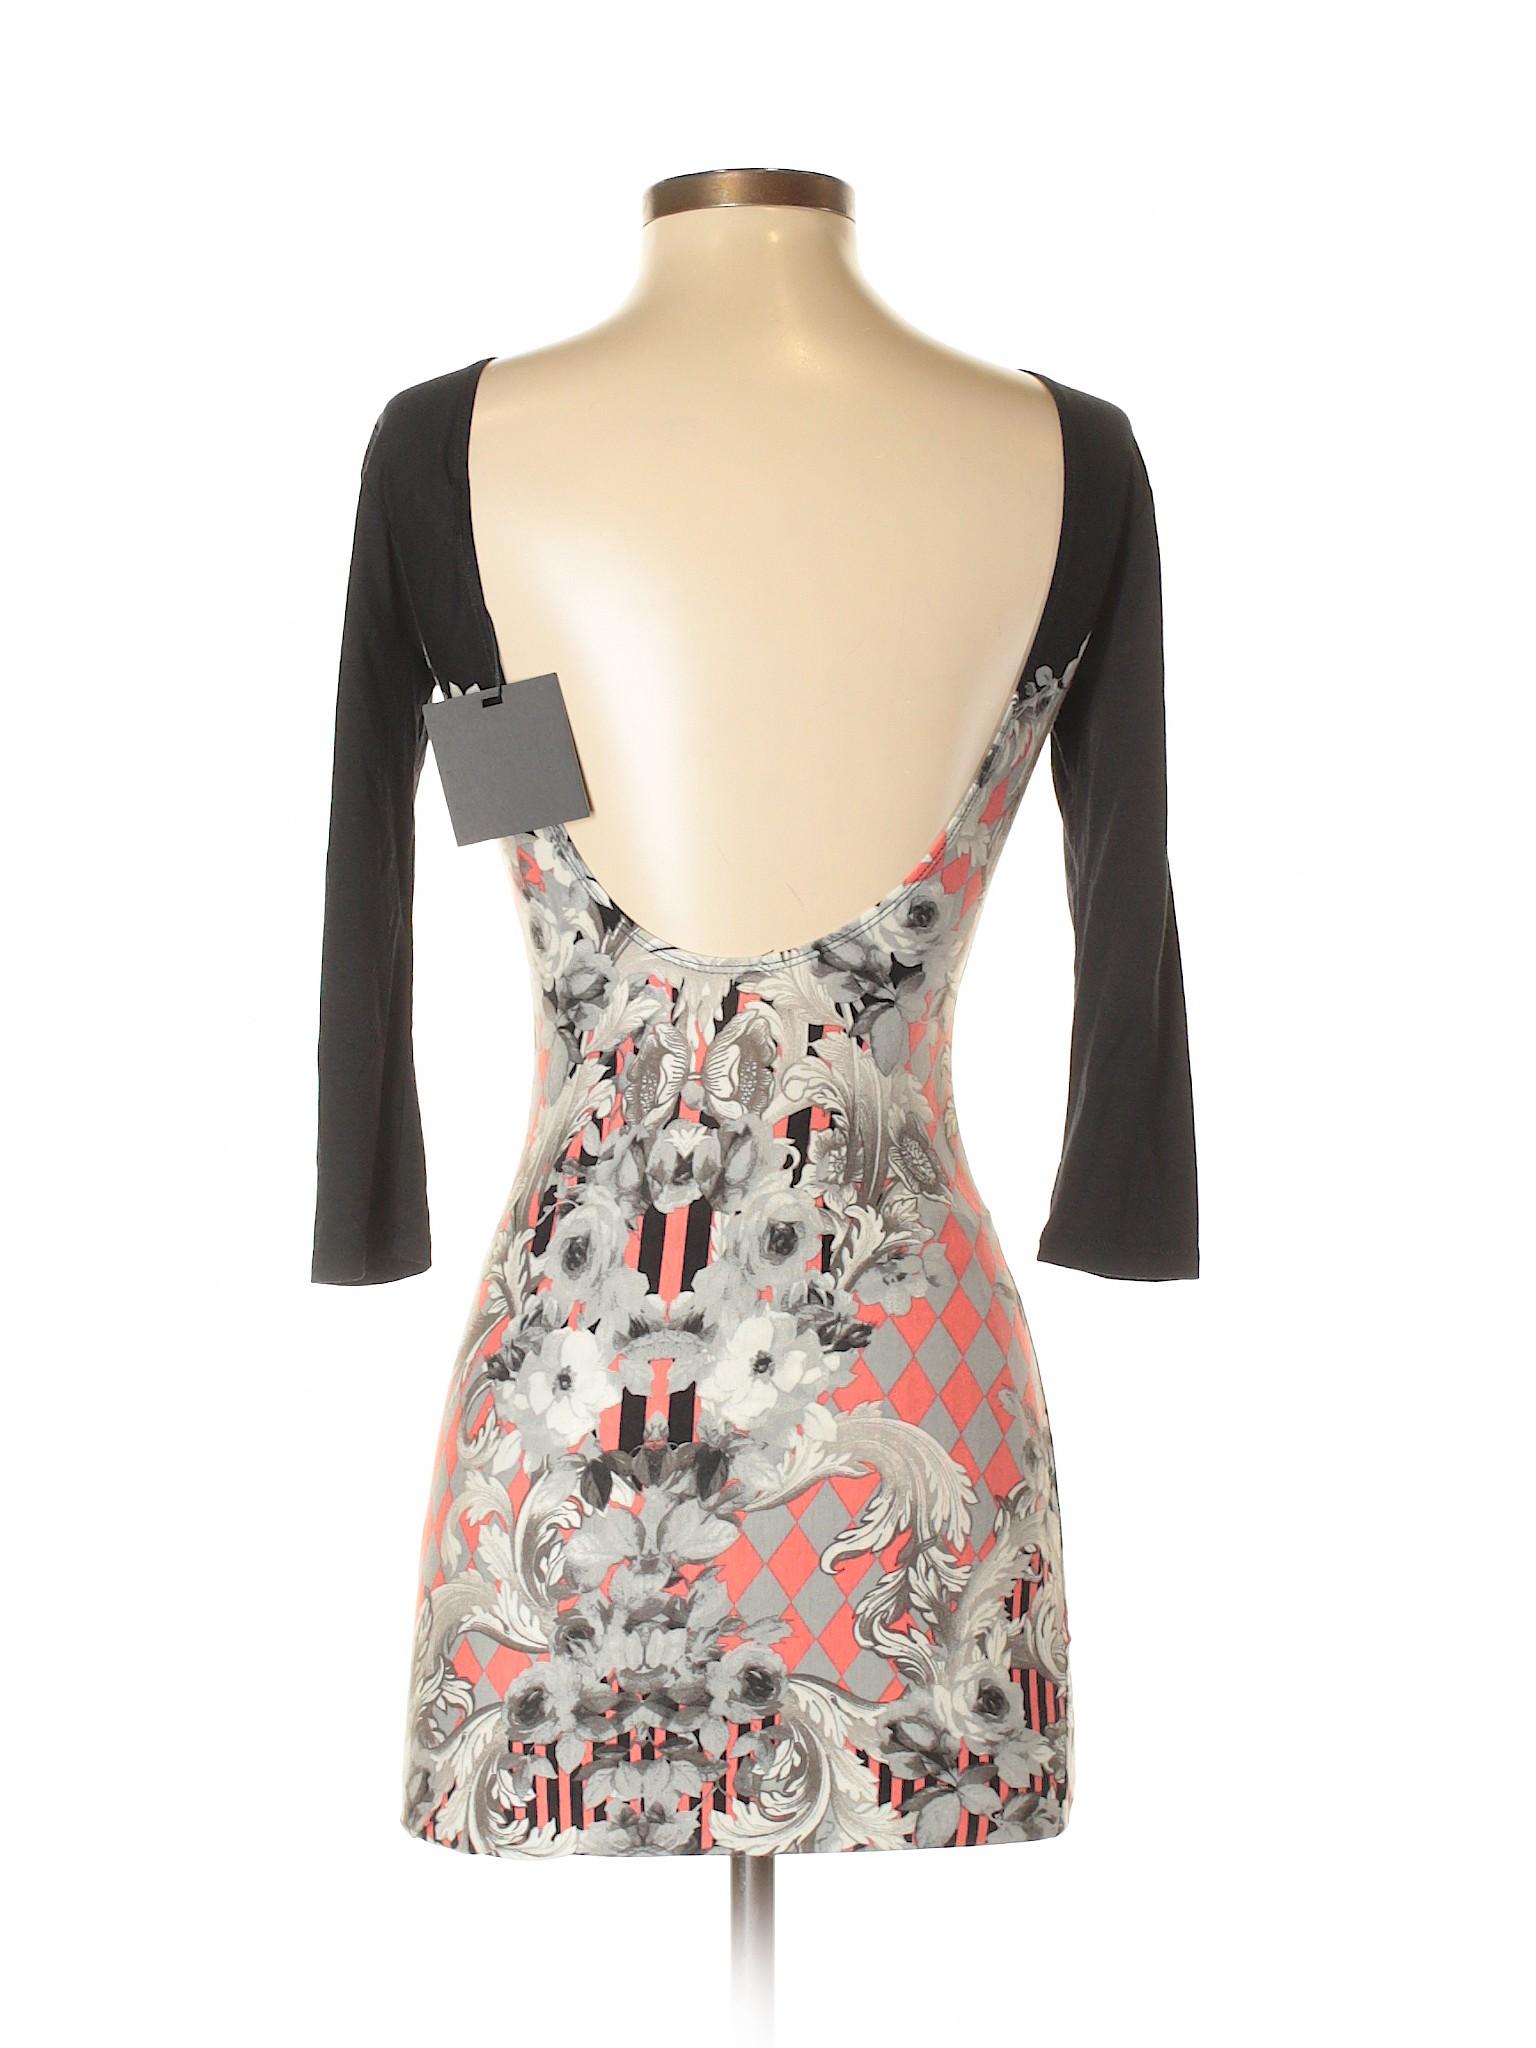 Dress ASOS Dress Casual ASOS Selling Selling Casual IxwWgq56